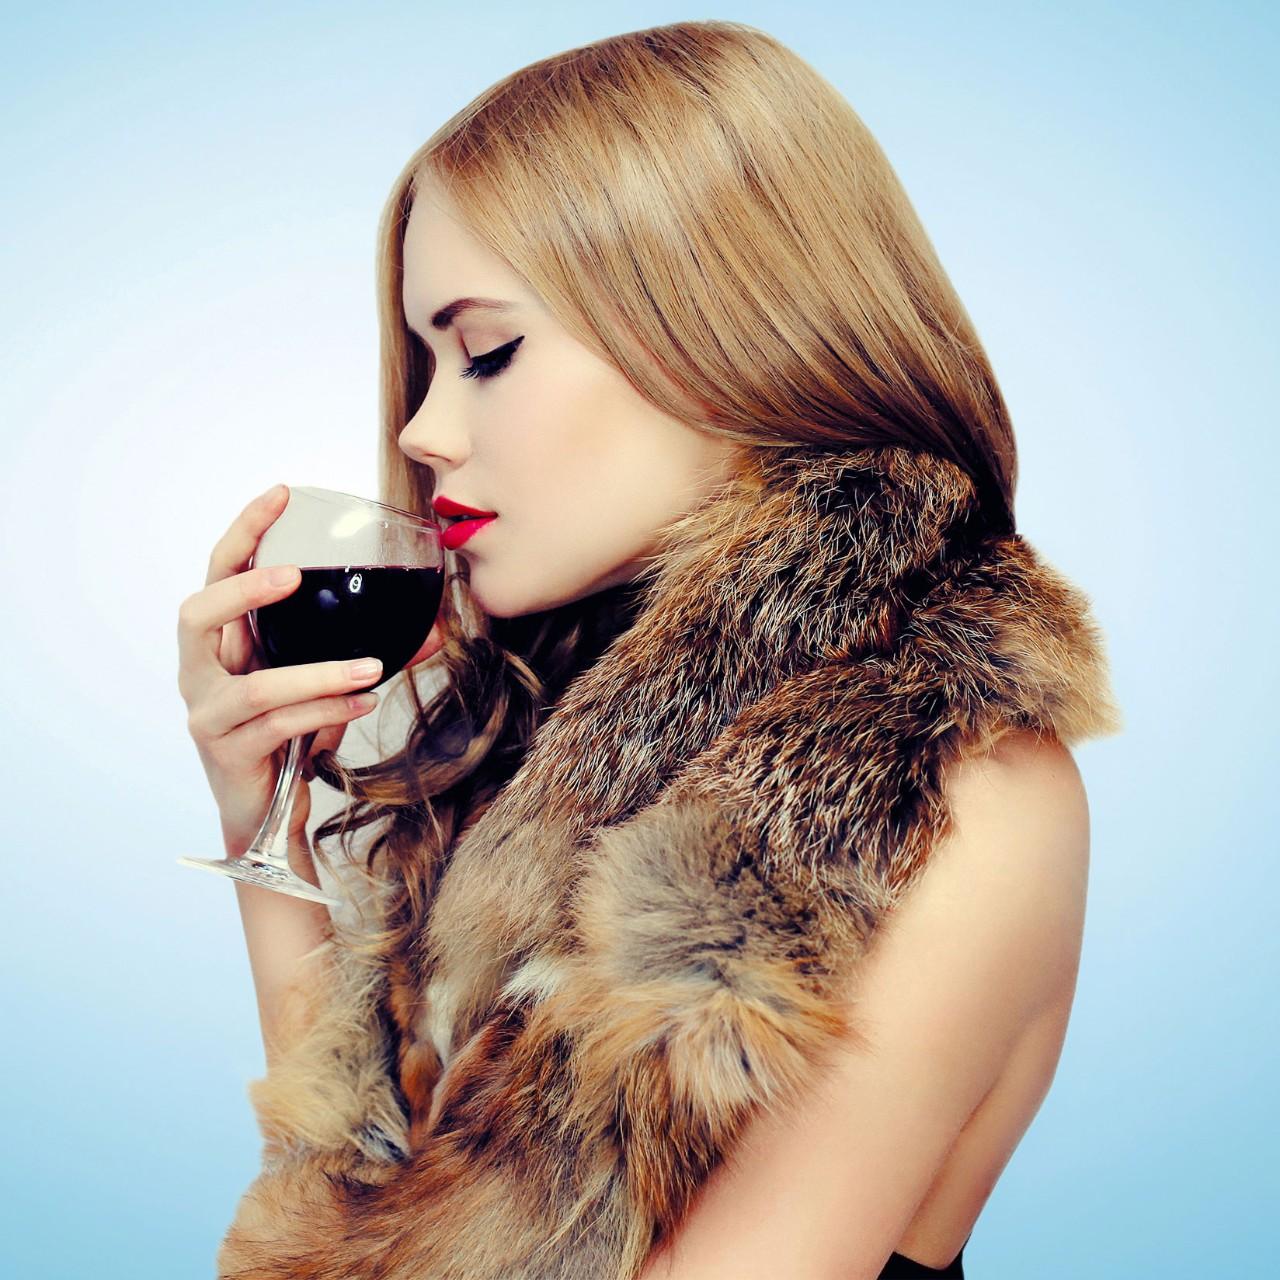 1. Alcohol